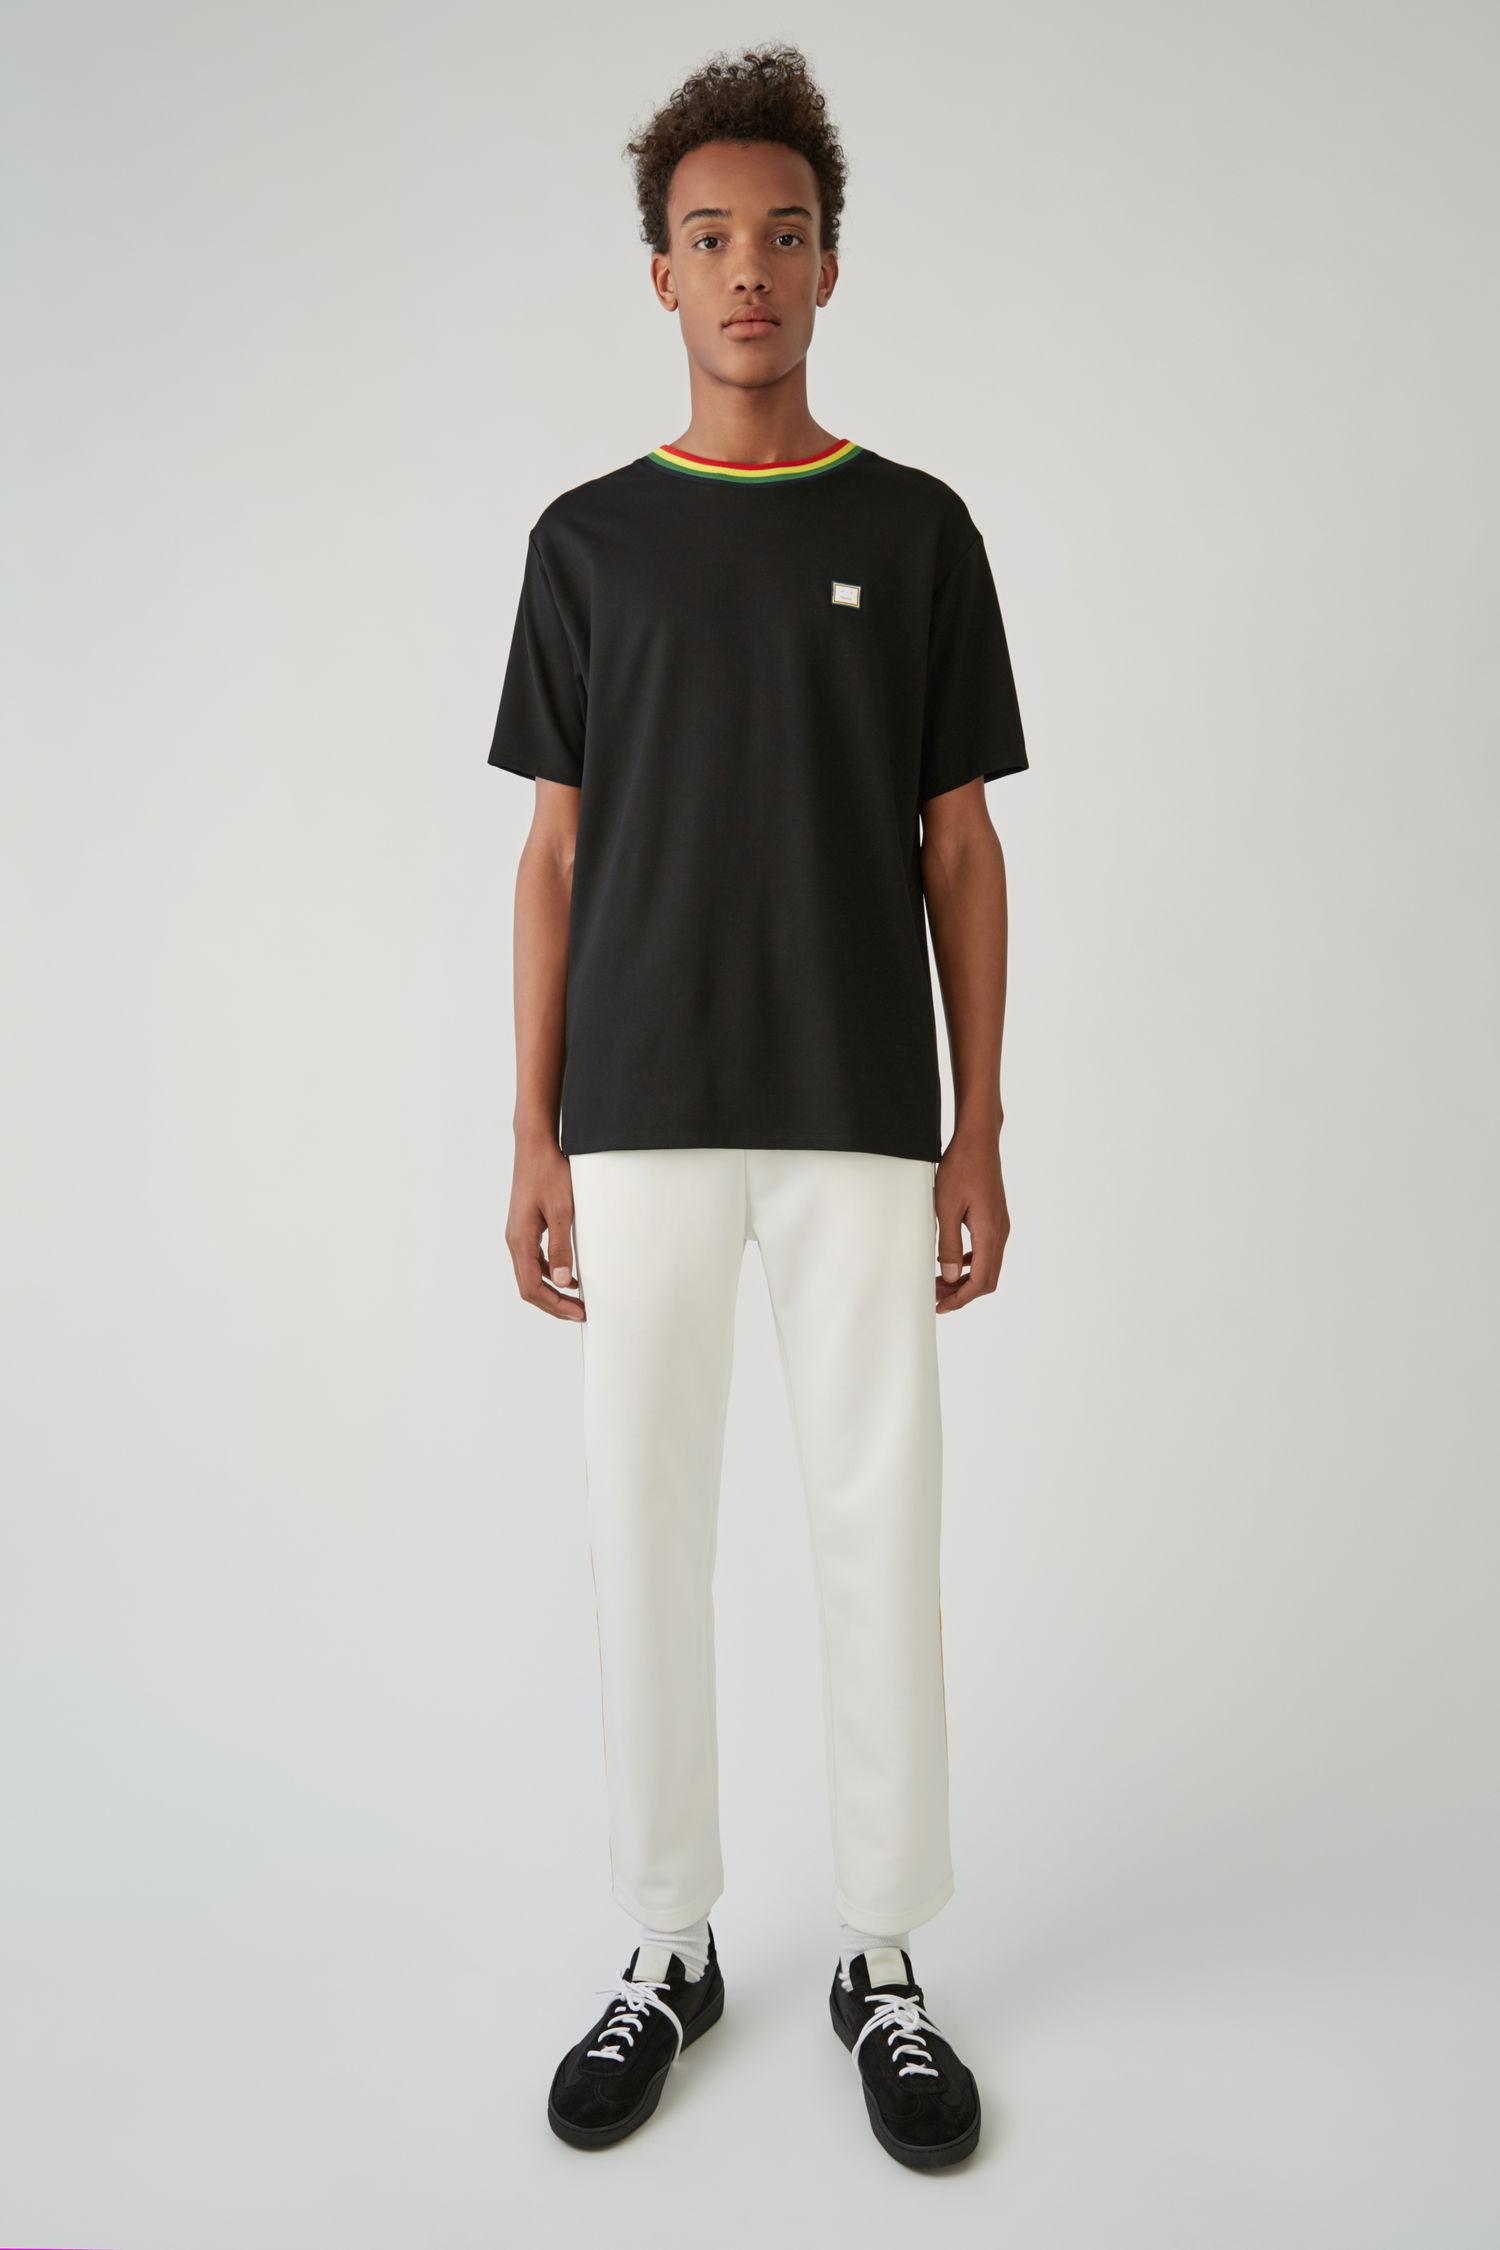 Acne Studios Regular Fit T-shirt Black In White